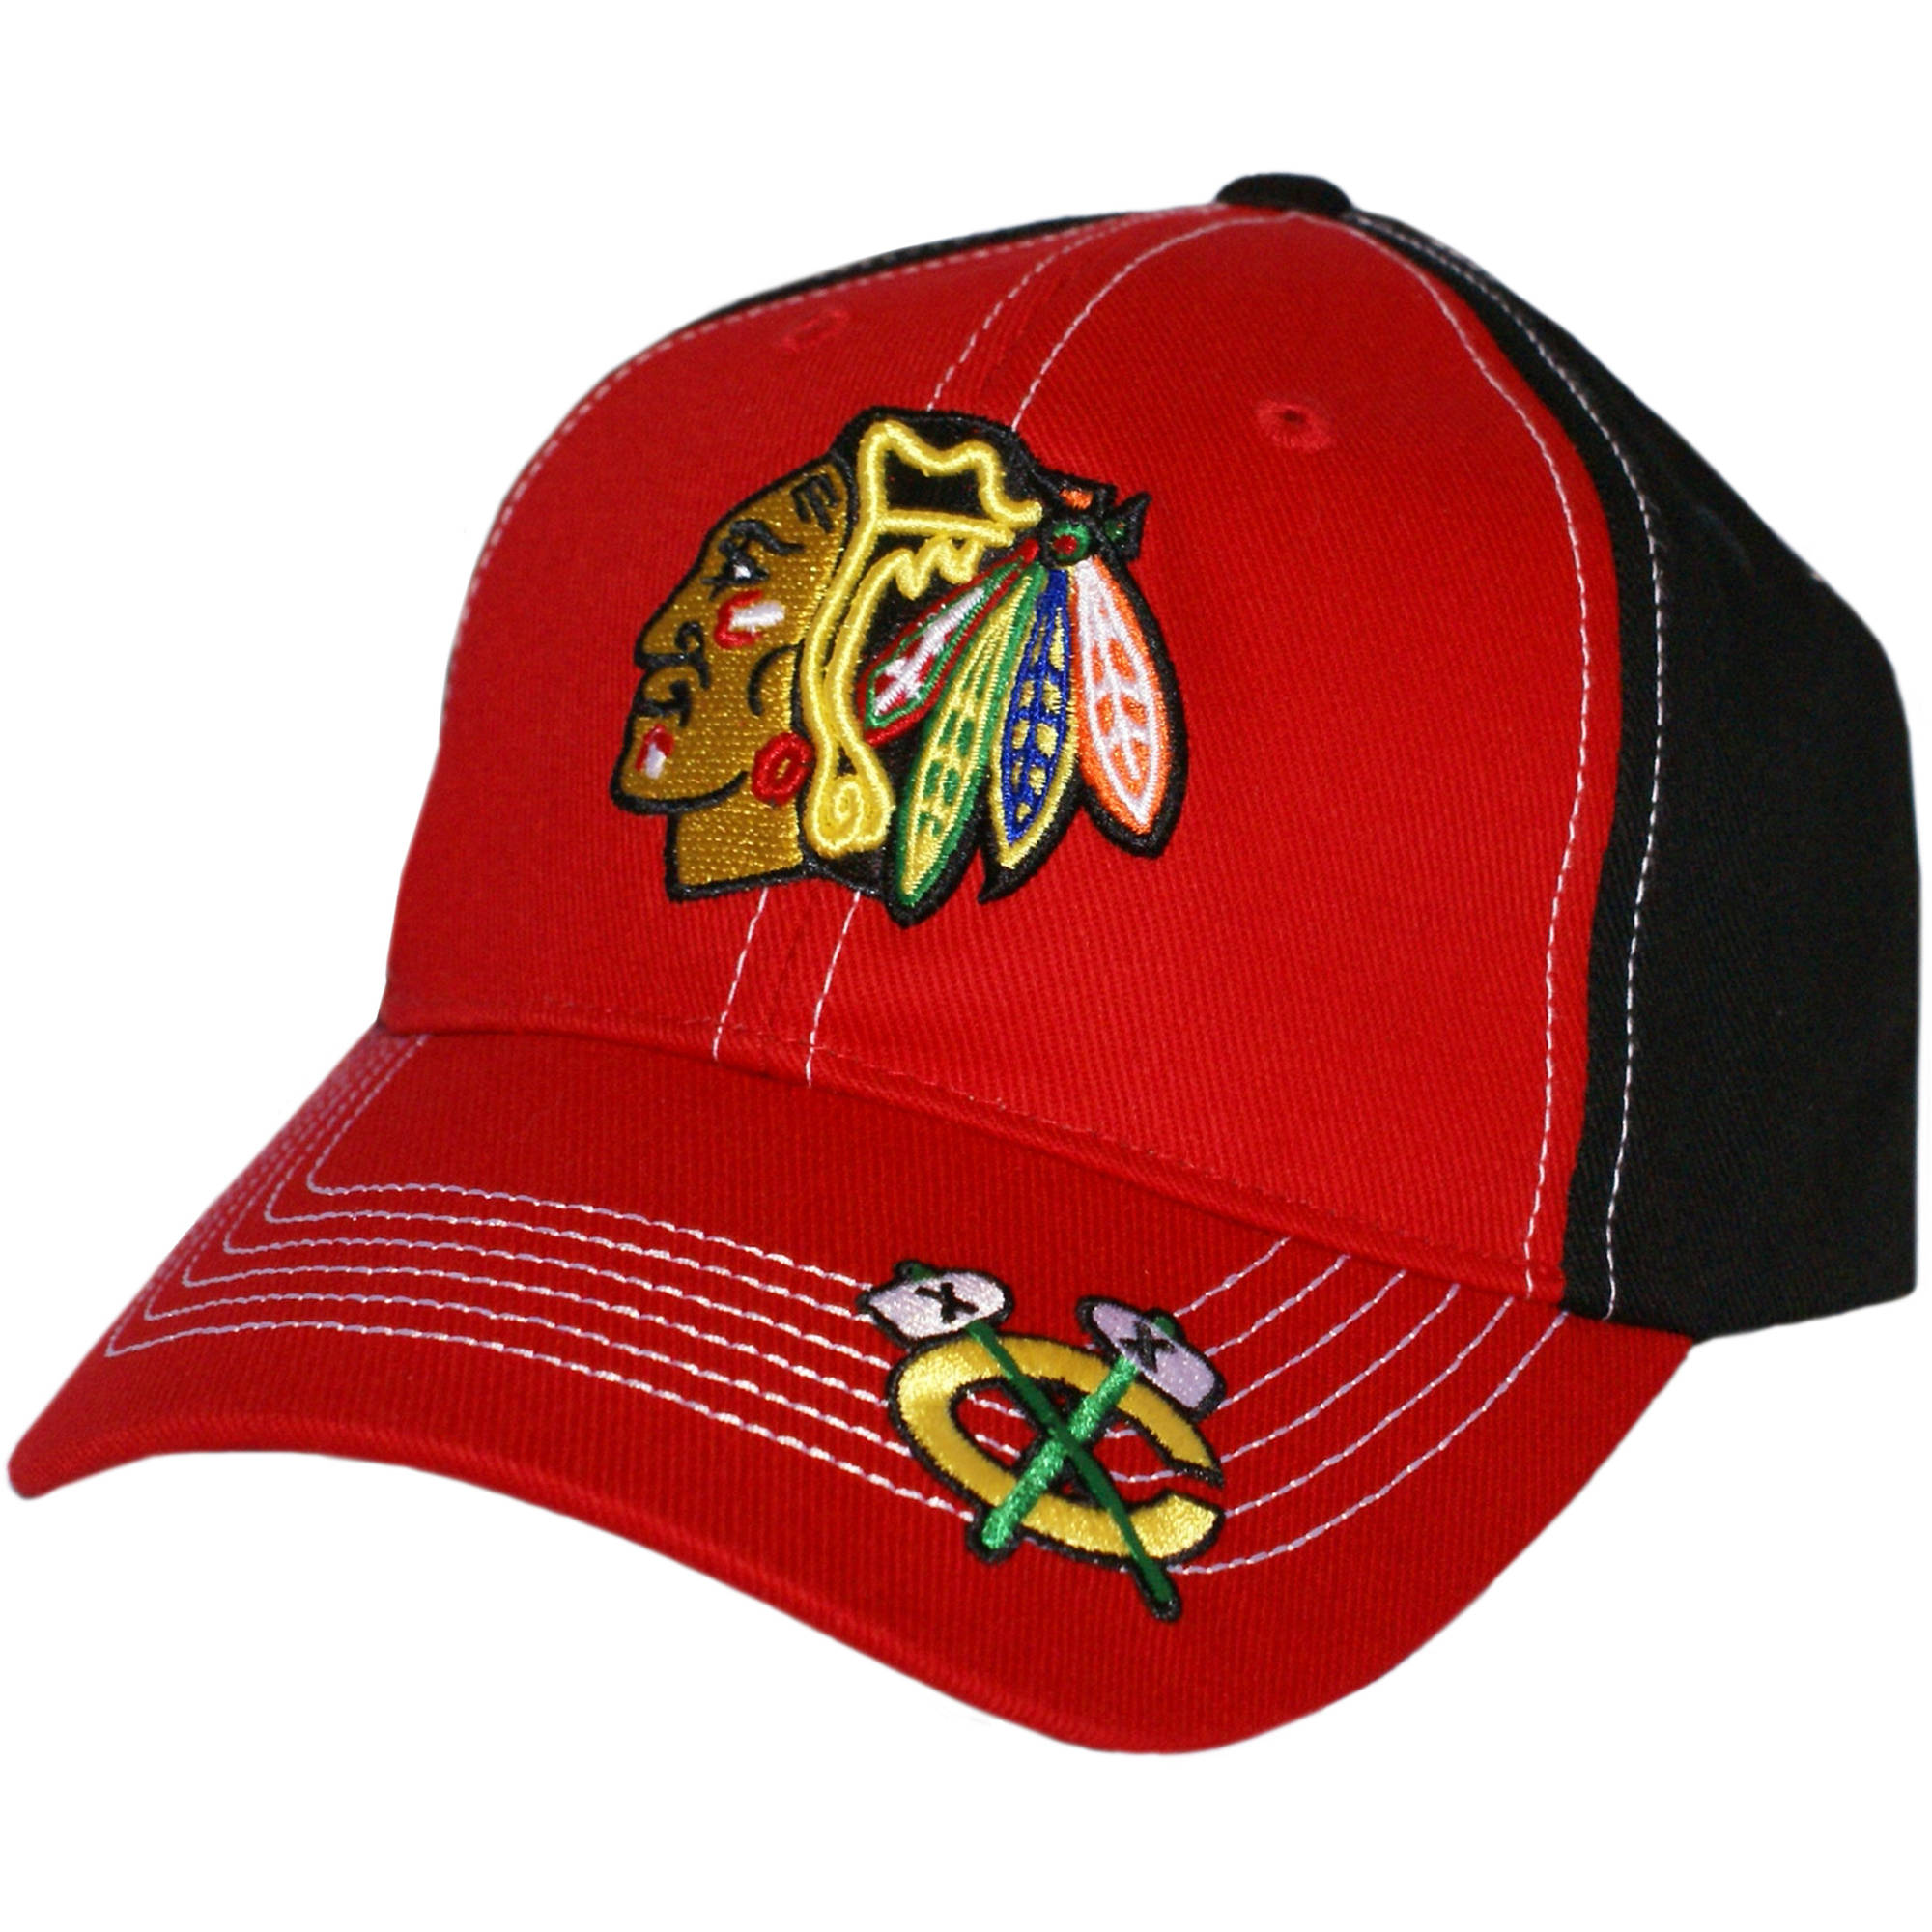 NHL Chicago Blackhawks Revolver Cap / Hat by Fan Favorite